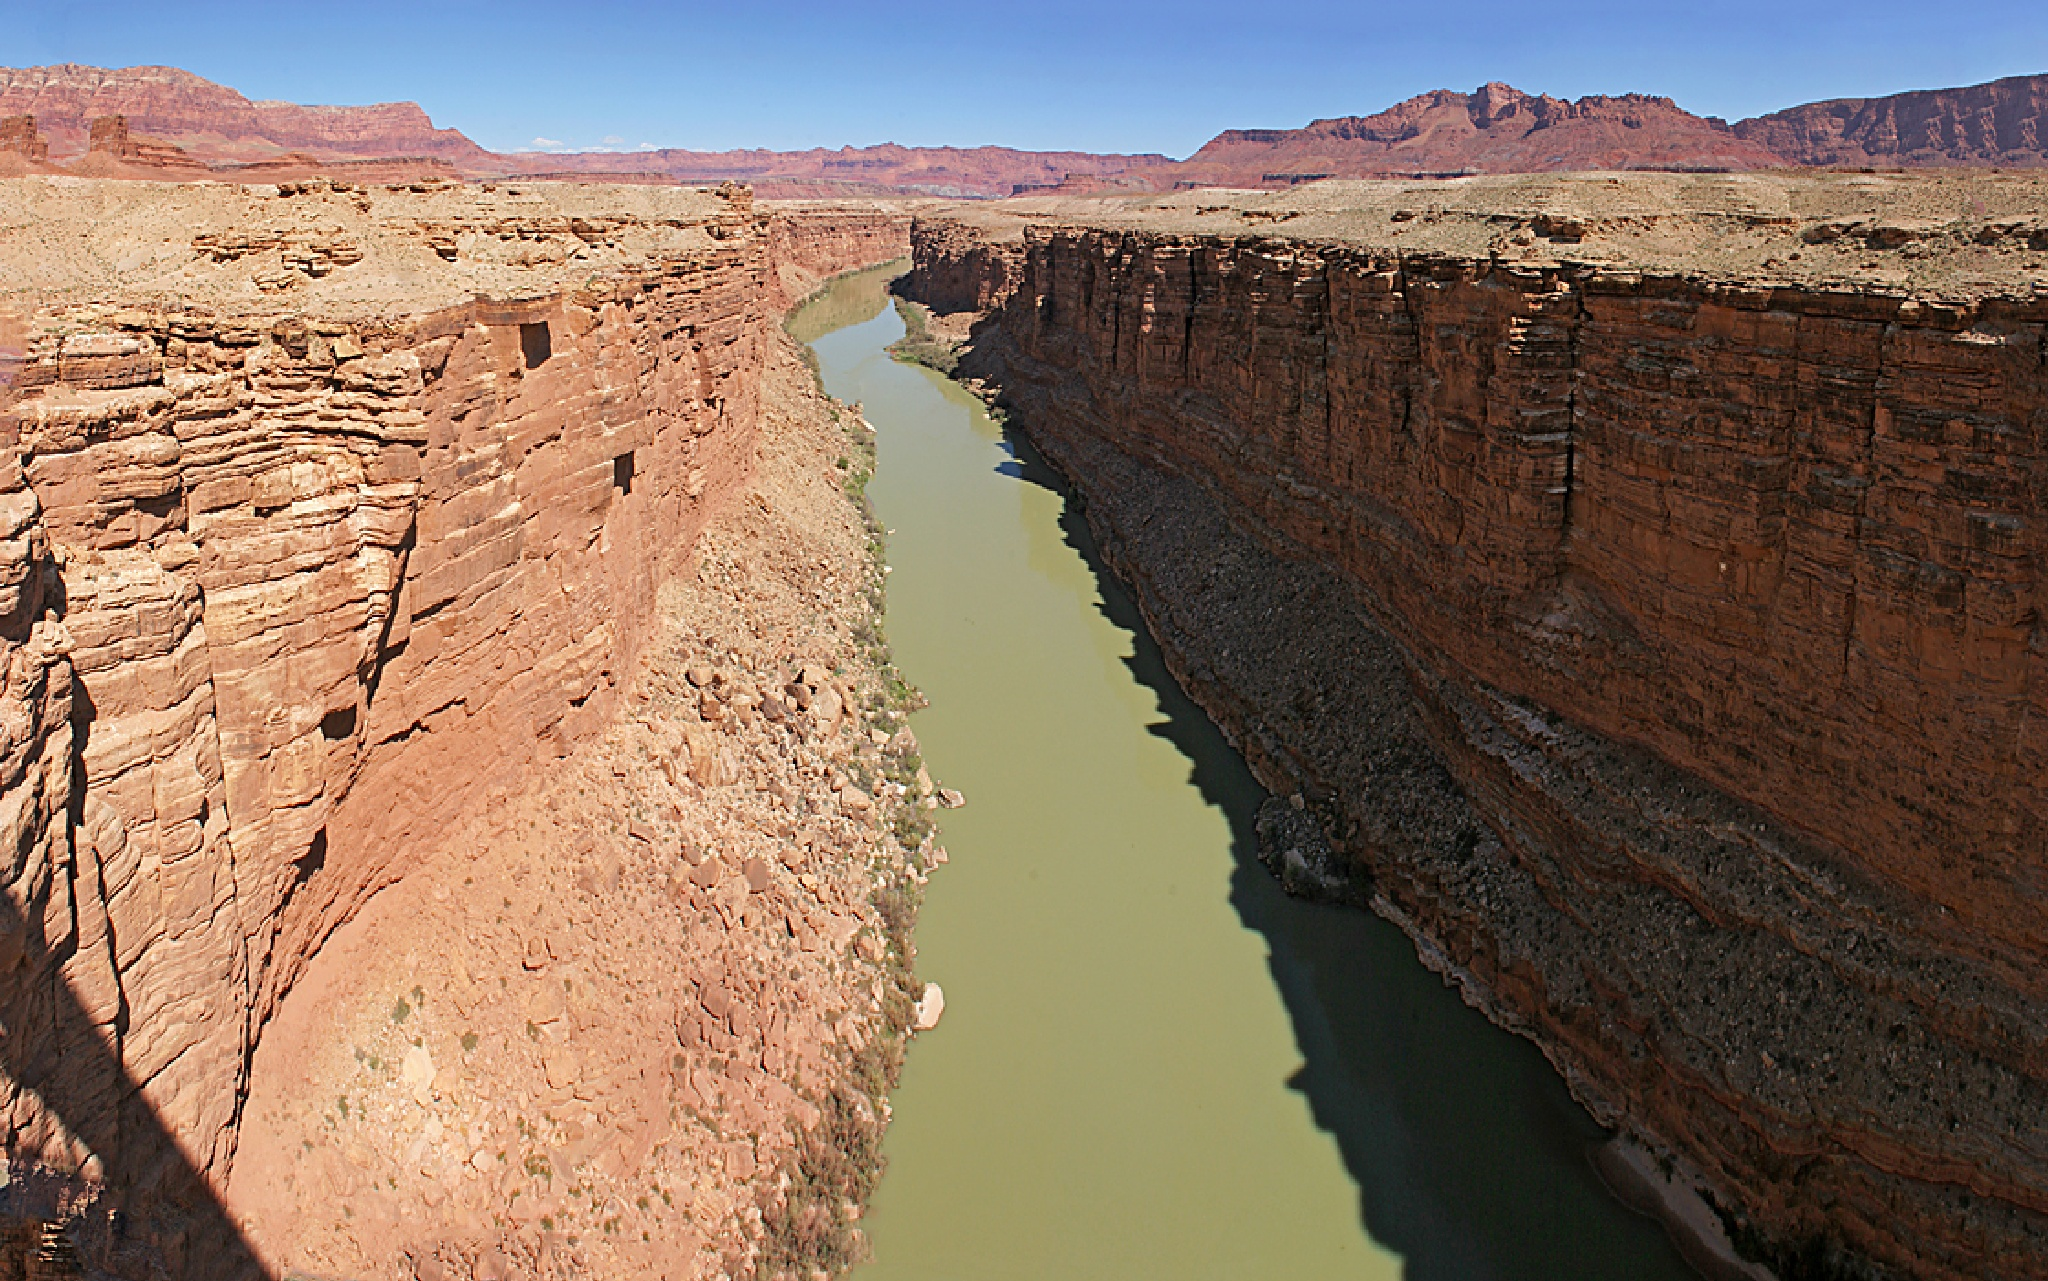 Colorado River at Navajo Bridge by Carl Main